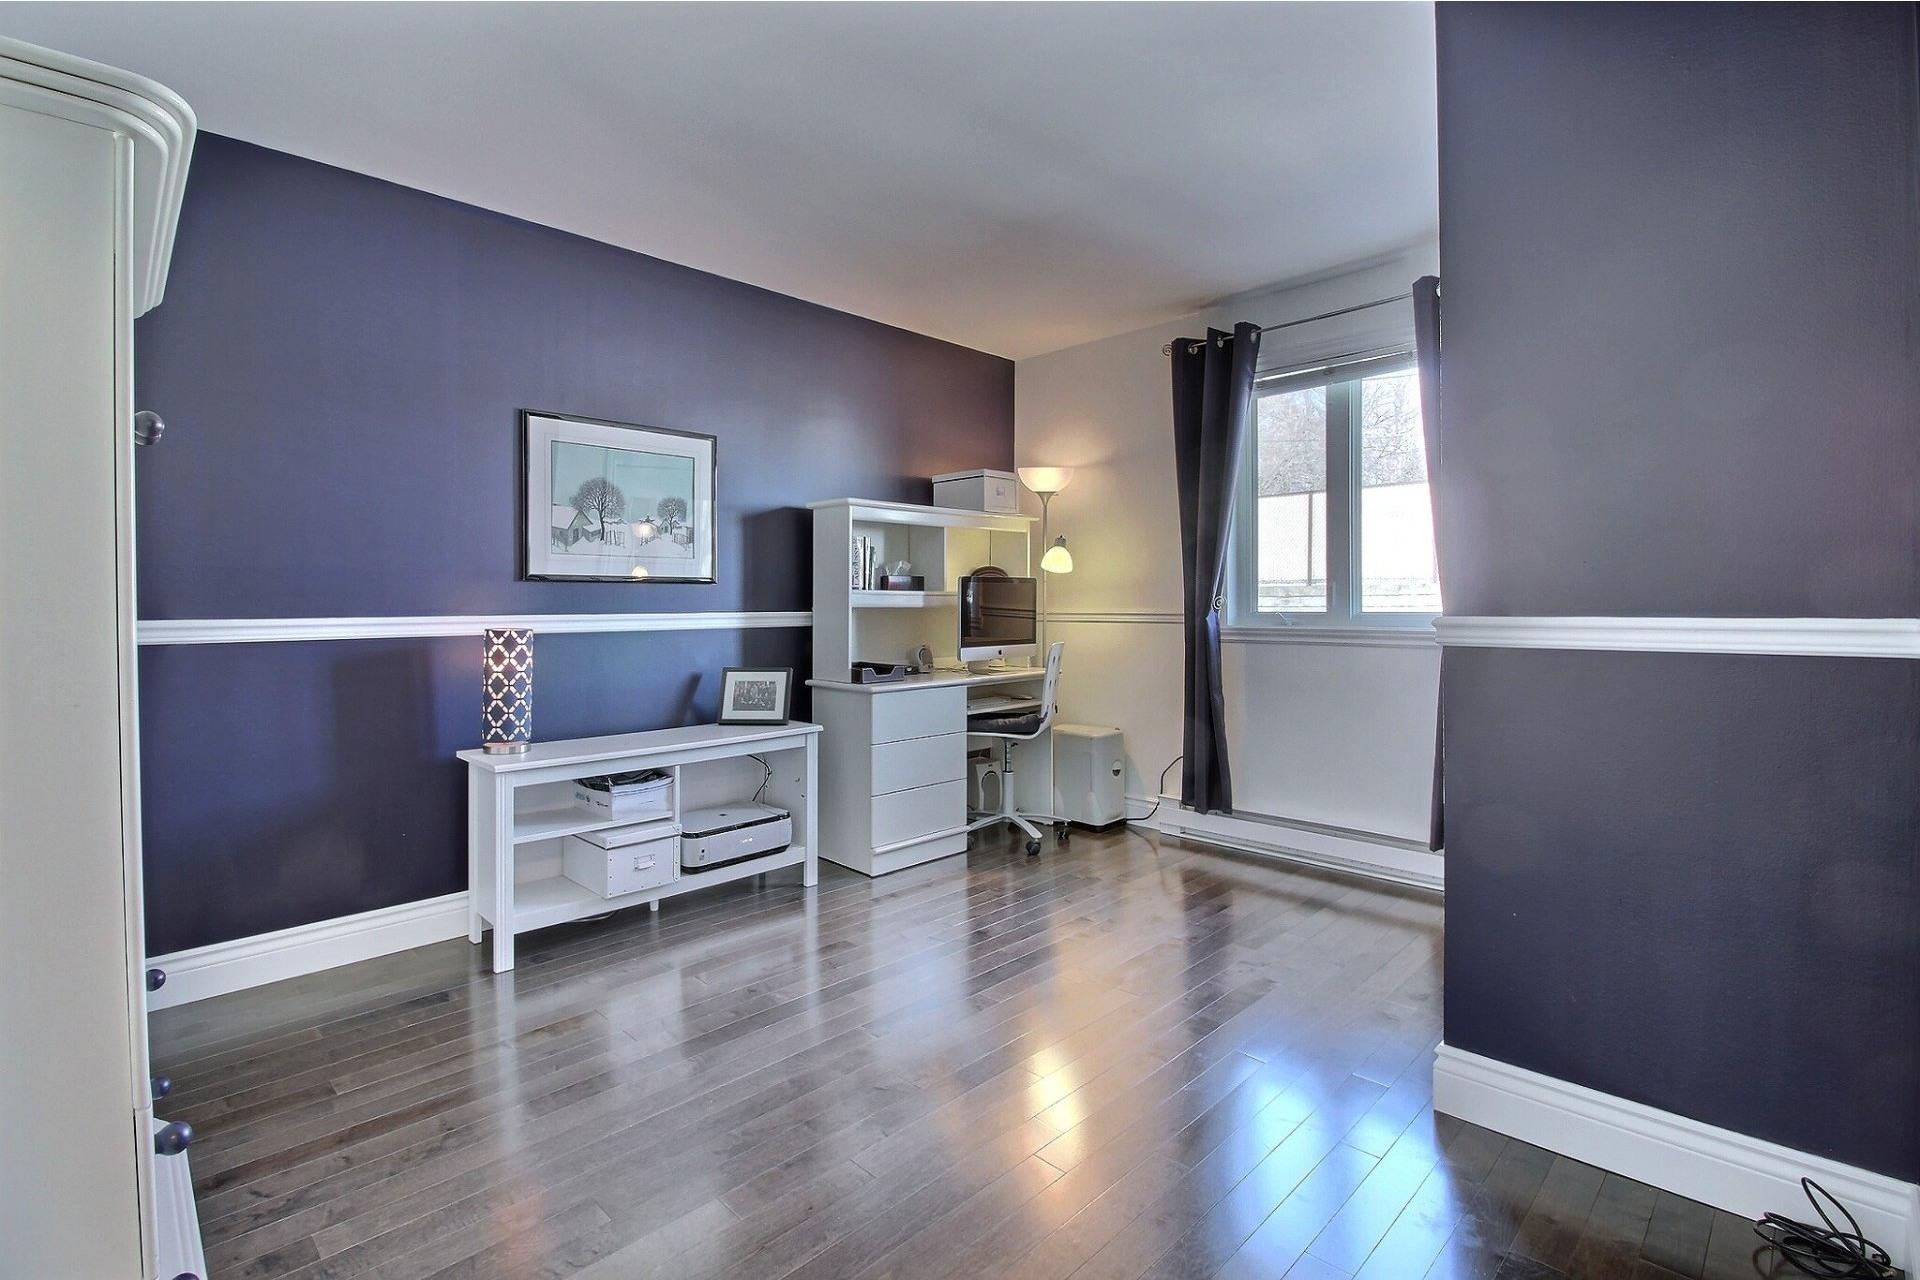 image 17 - House For sale Terrebonne Terrebonne  - 10 rooms